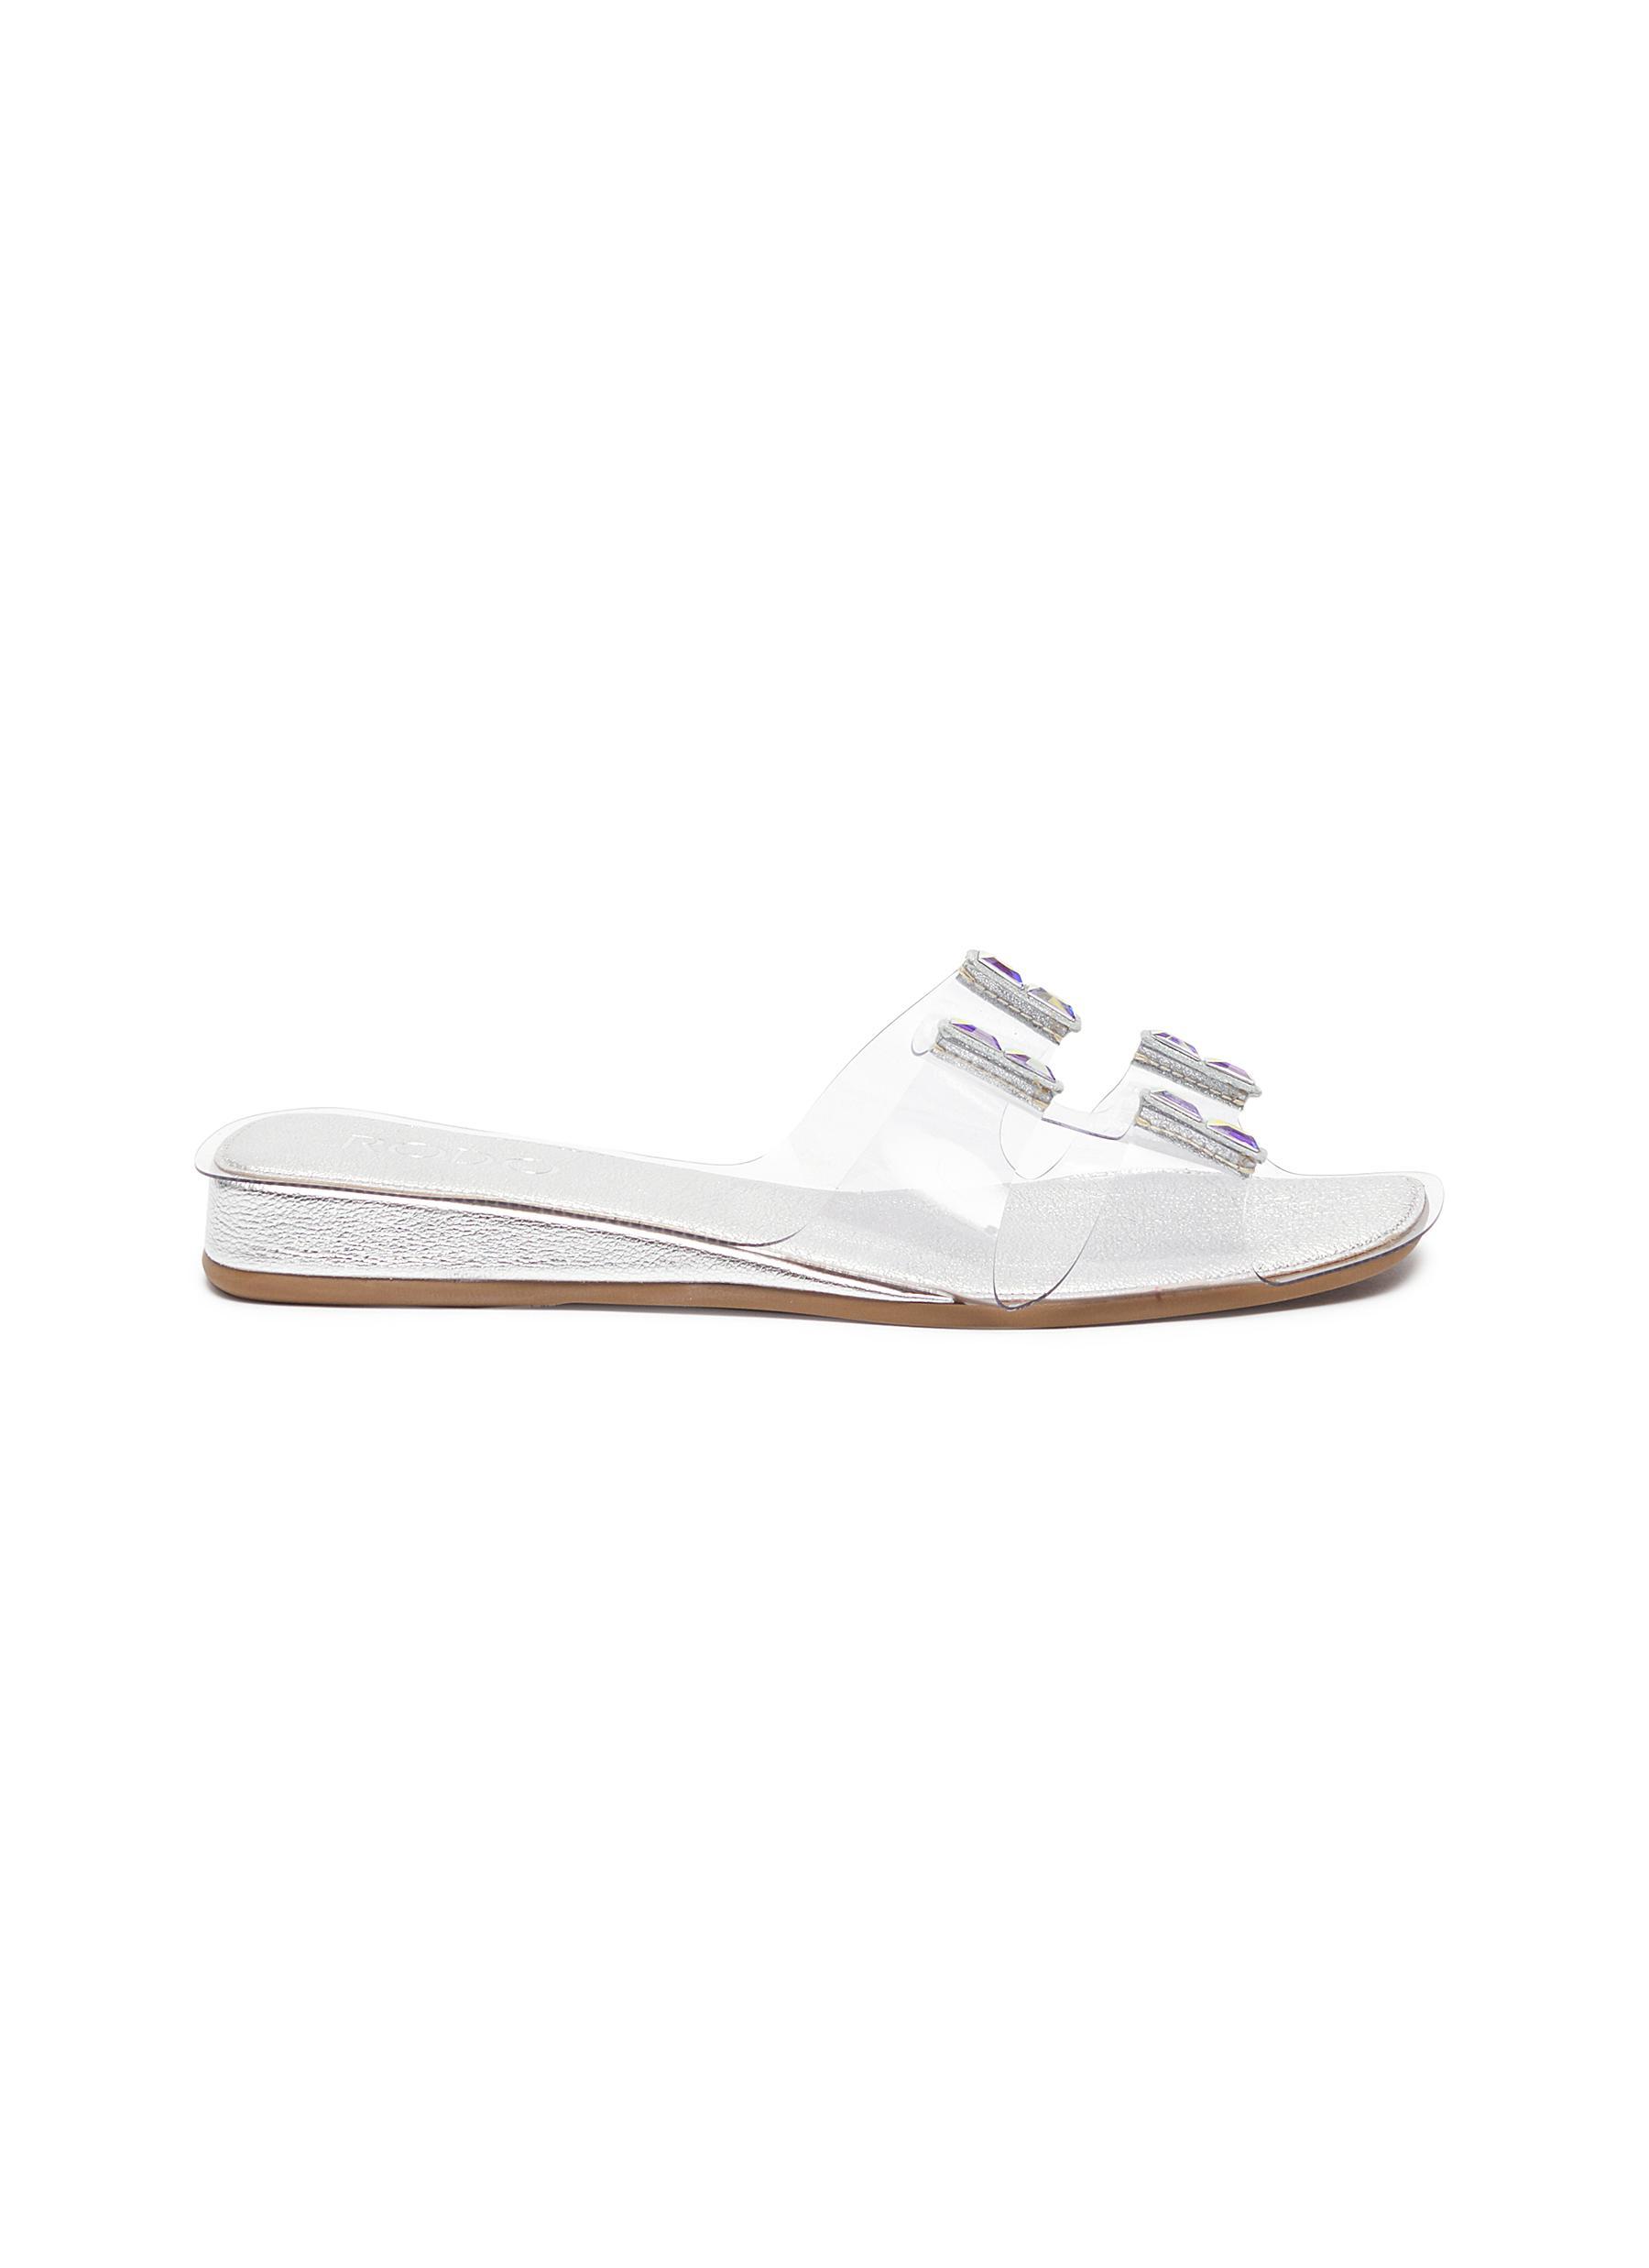 Rodo Strass embellished PVC sandals